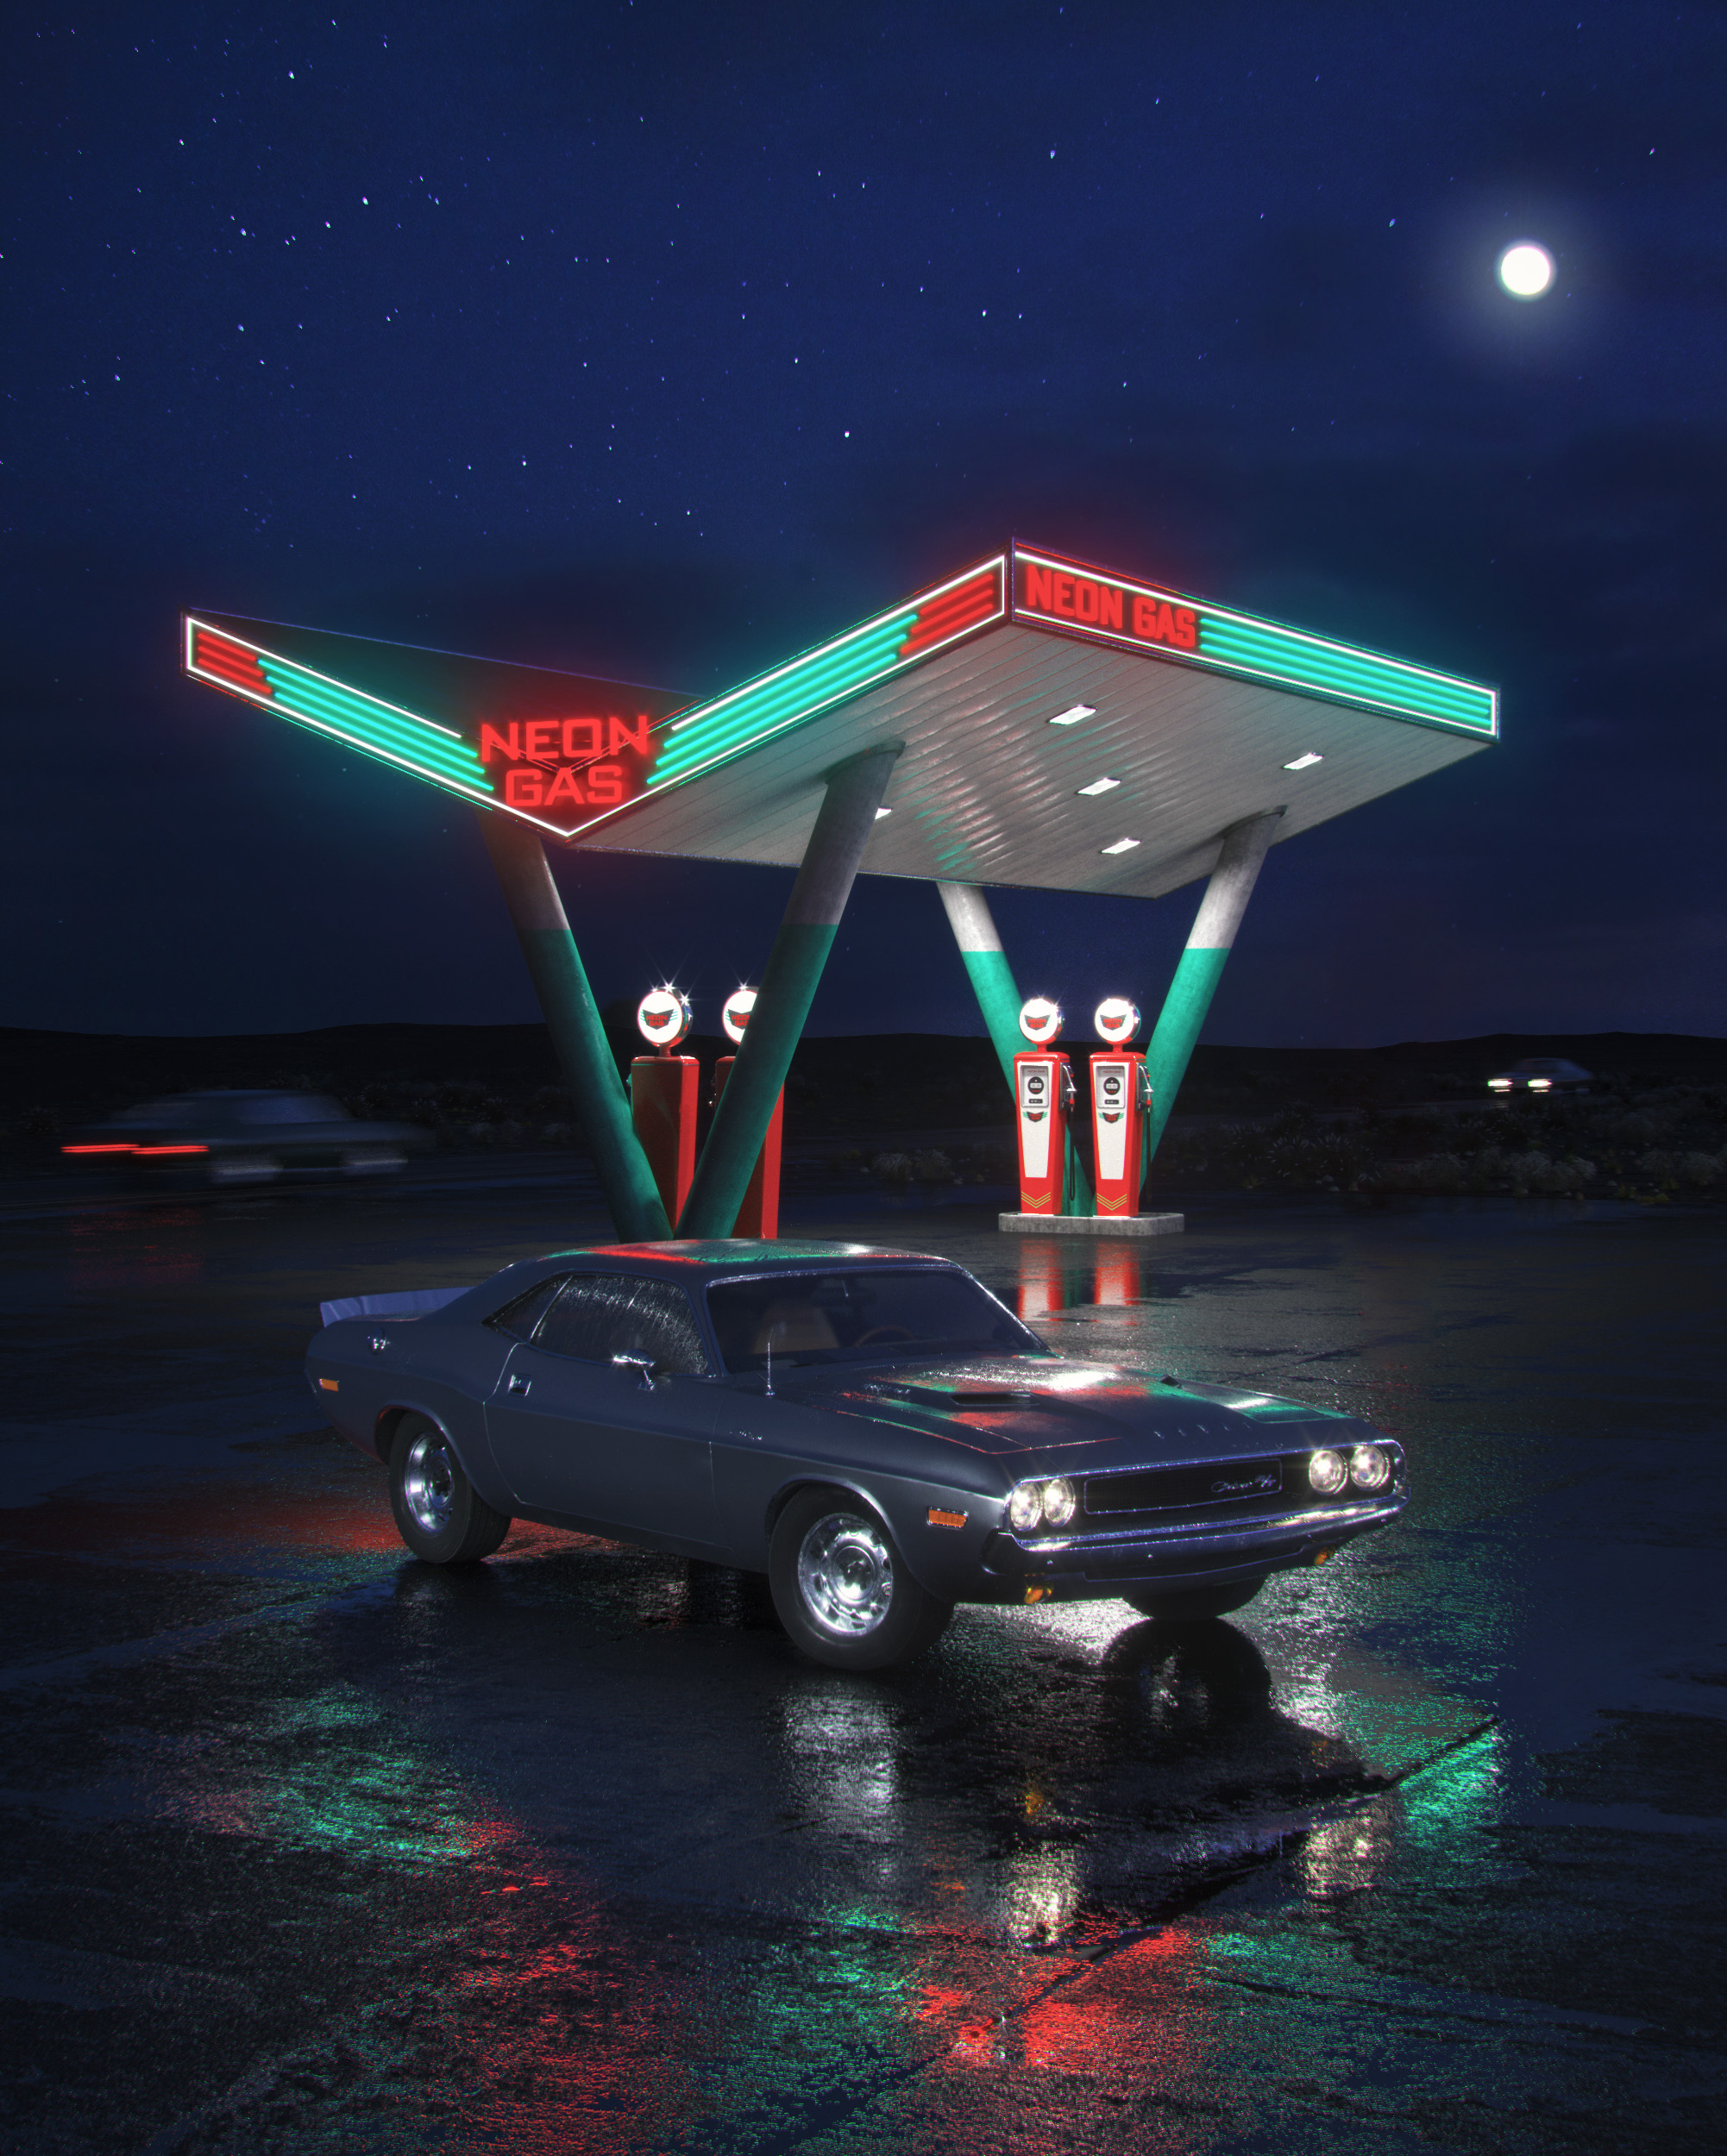 Neon Gas Station 3d art